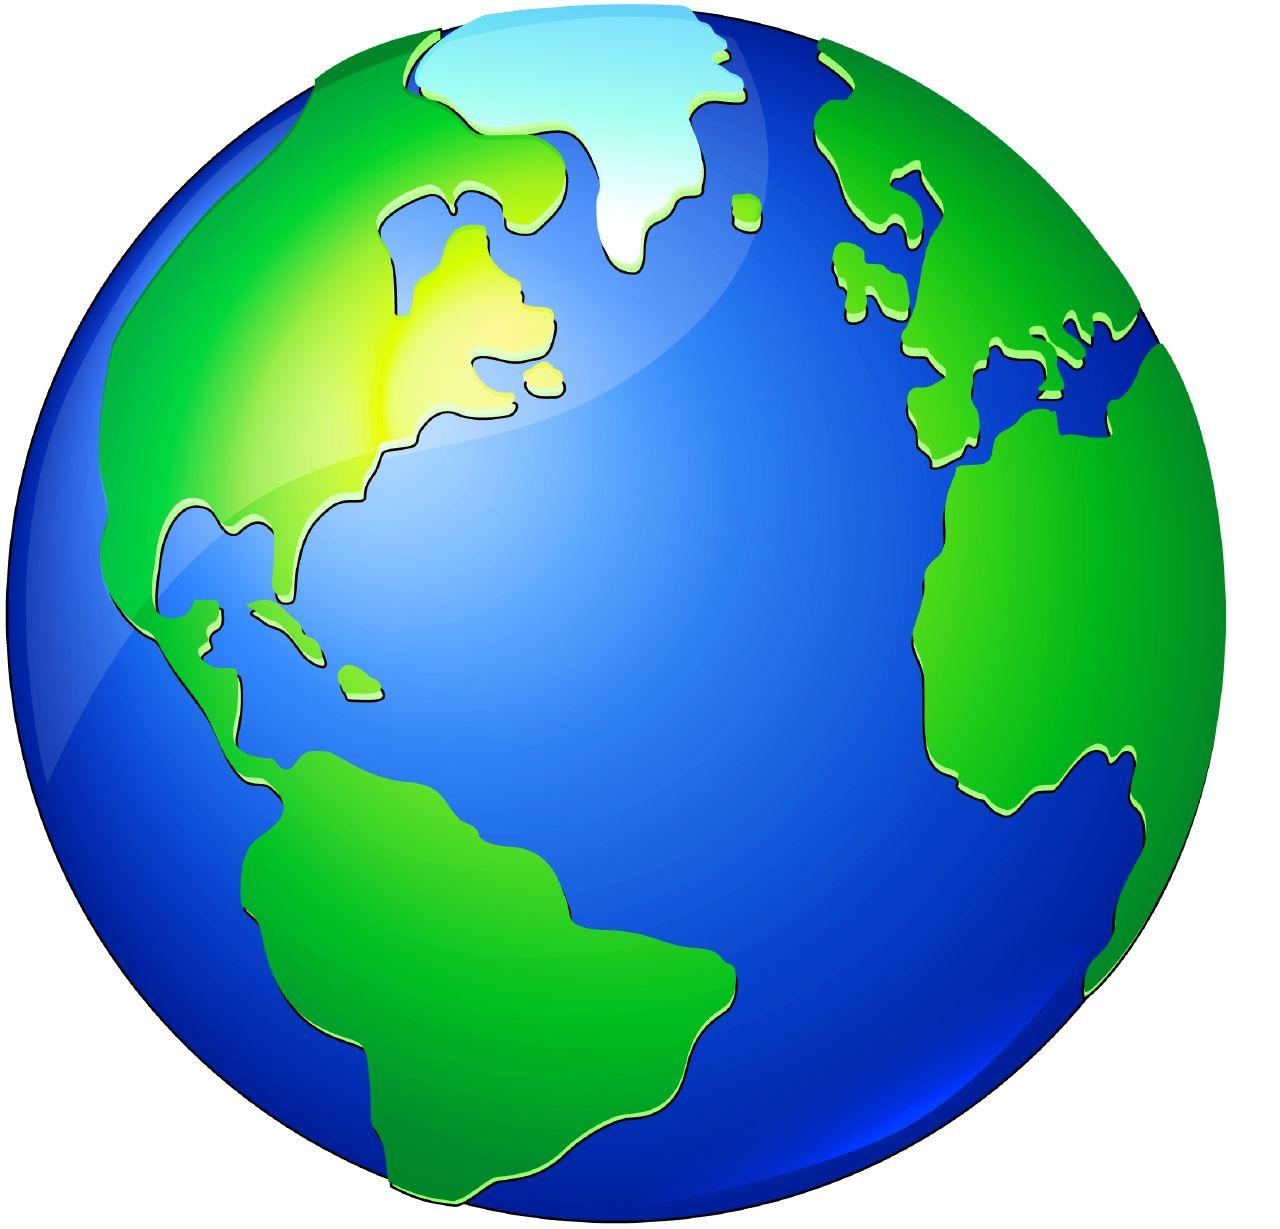 planet earth globe - photo #12